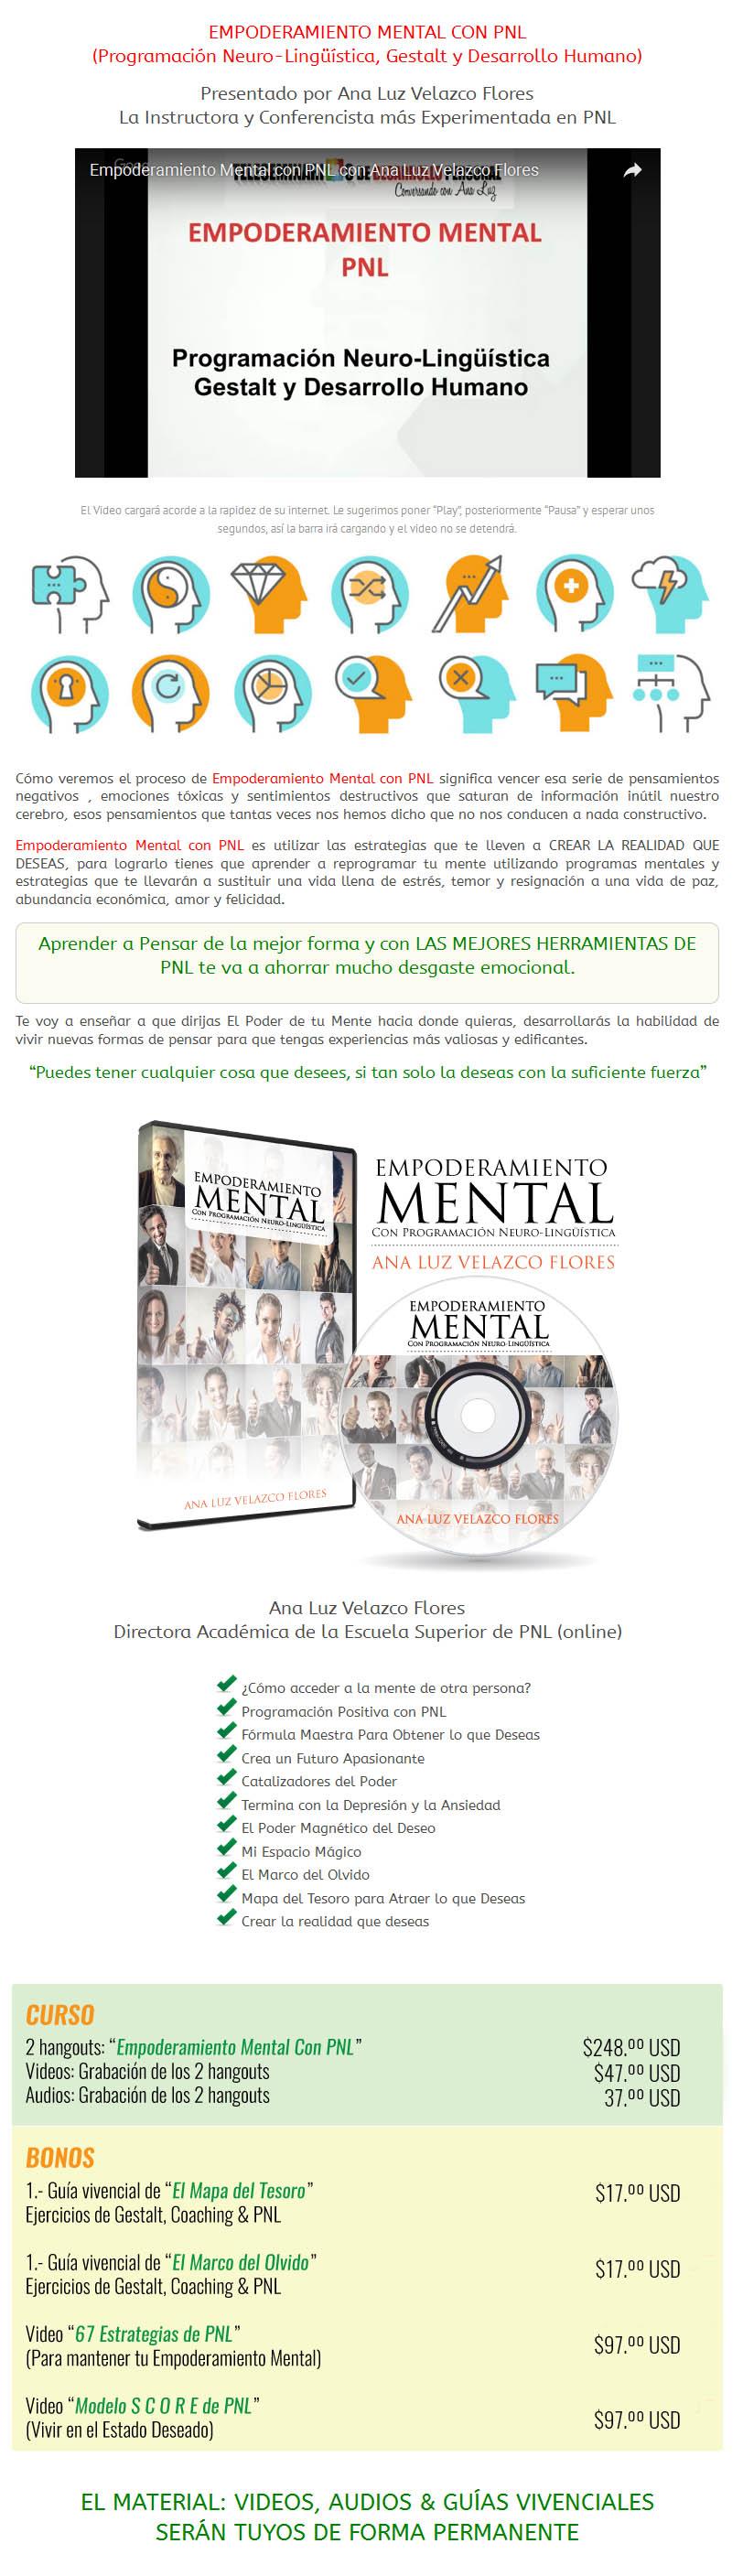 Empoderamiento Mental con PNL - Cursos De Remate